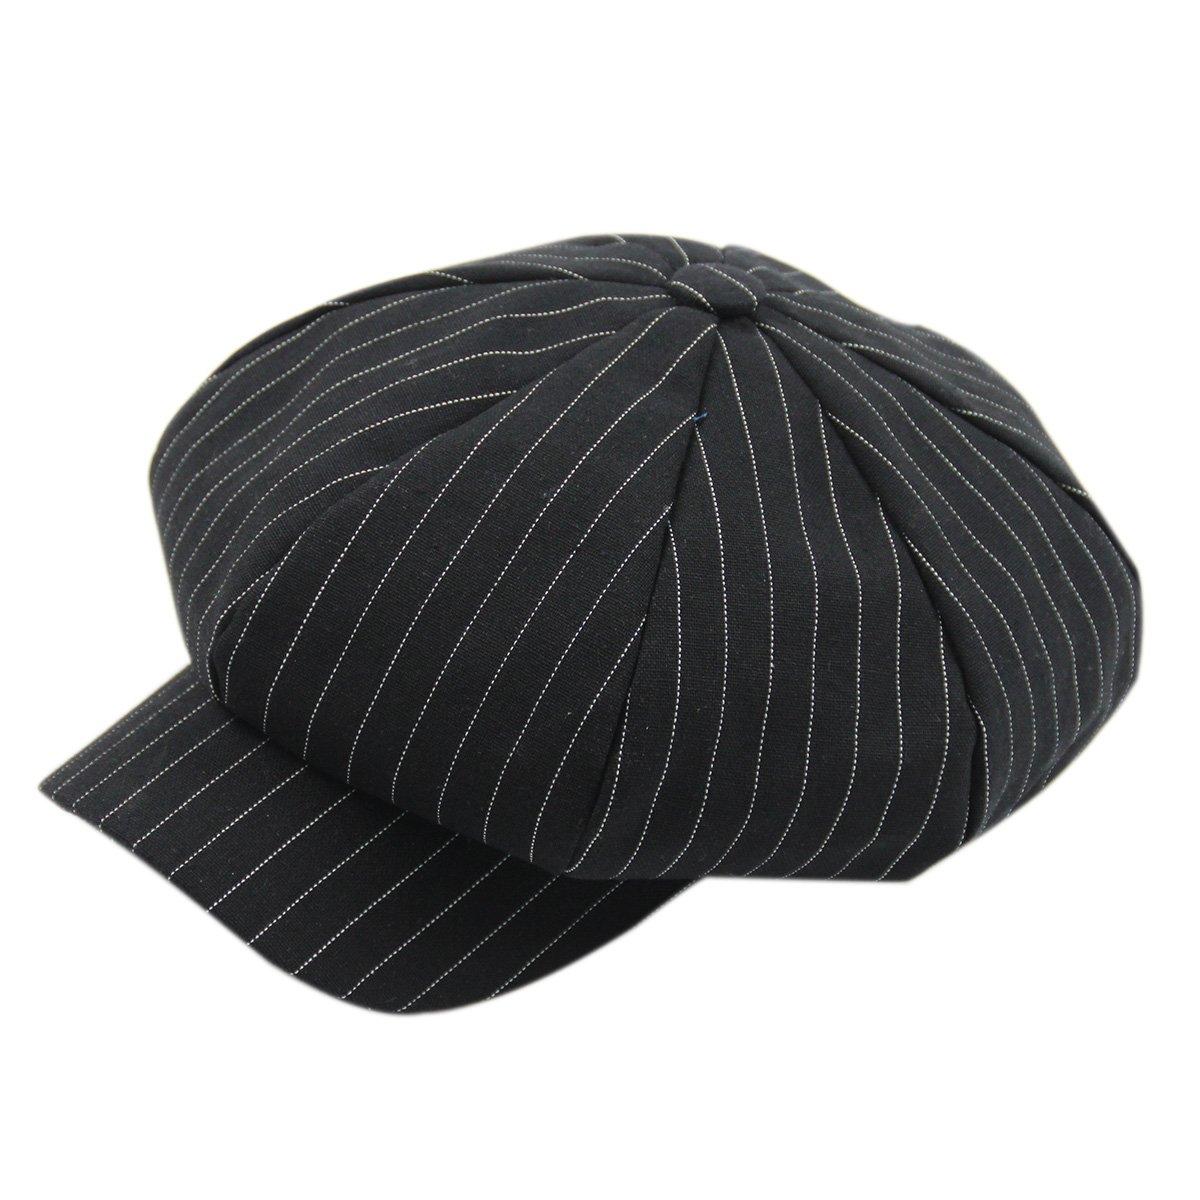 ZLS Women's Retro Washed Denim Peaked Newsboy Gatsby Cap Cabbie Hats (3-blacktiao)